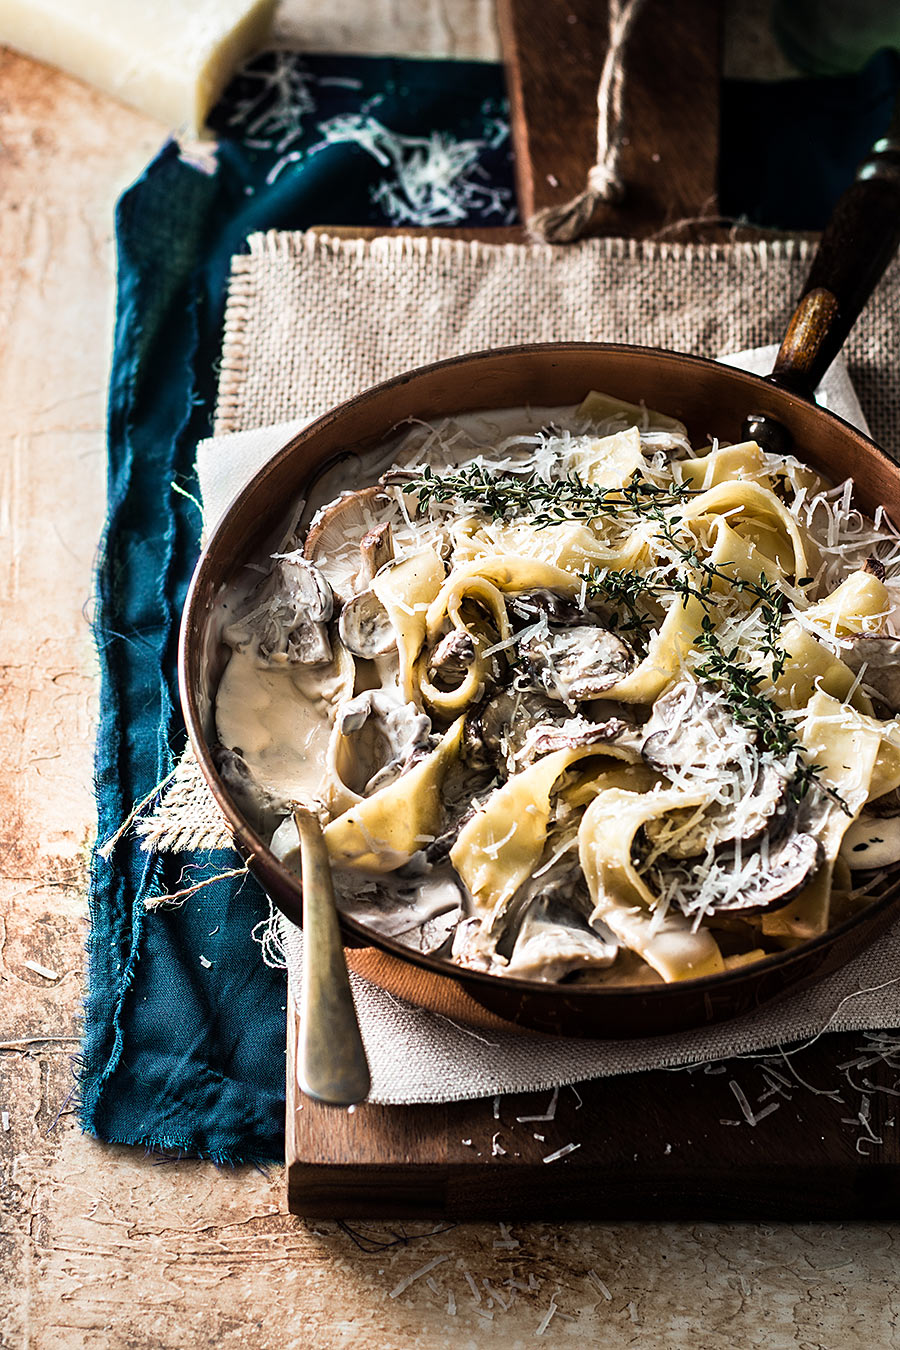 Taggliatela with mushroom sauce by Laura Domingo